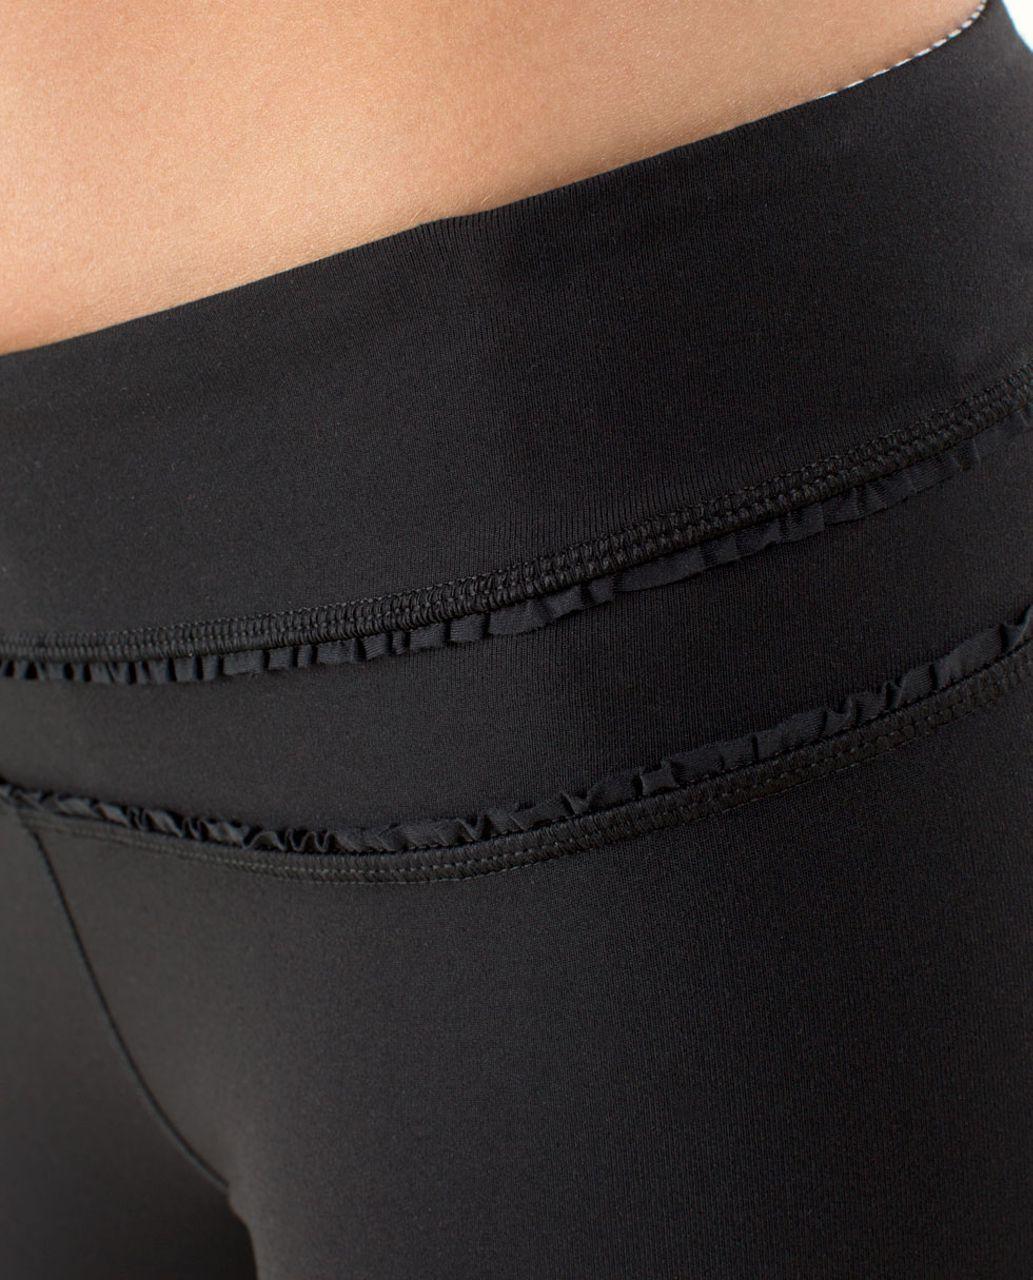 Lululemon Groove Pant *Ruffled Up - Black / Hyper Stripe Angel Wing